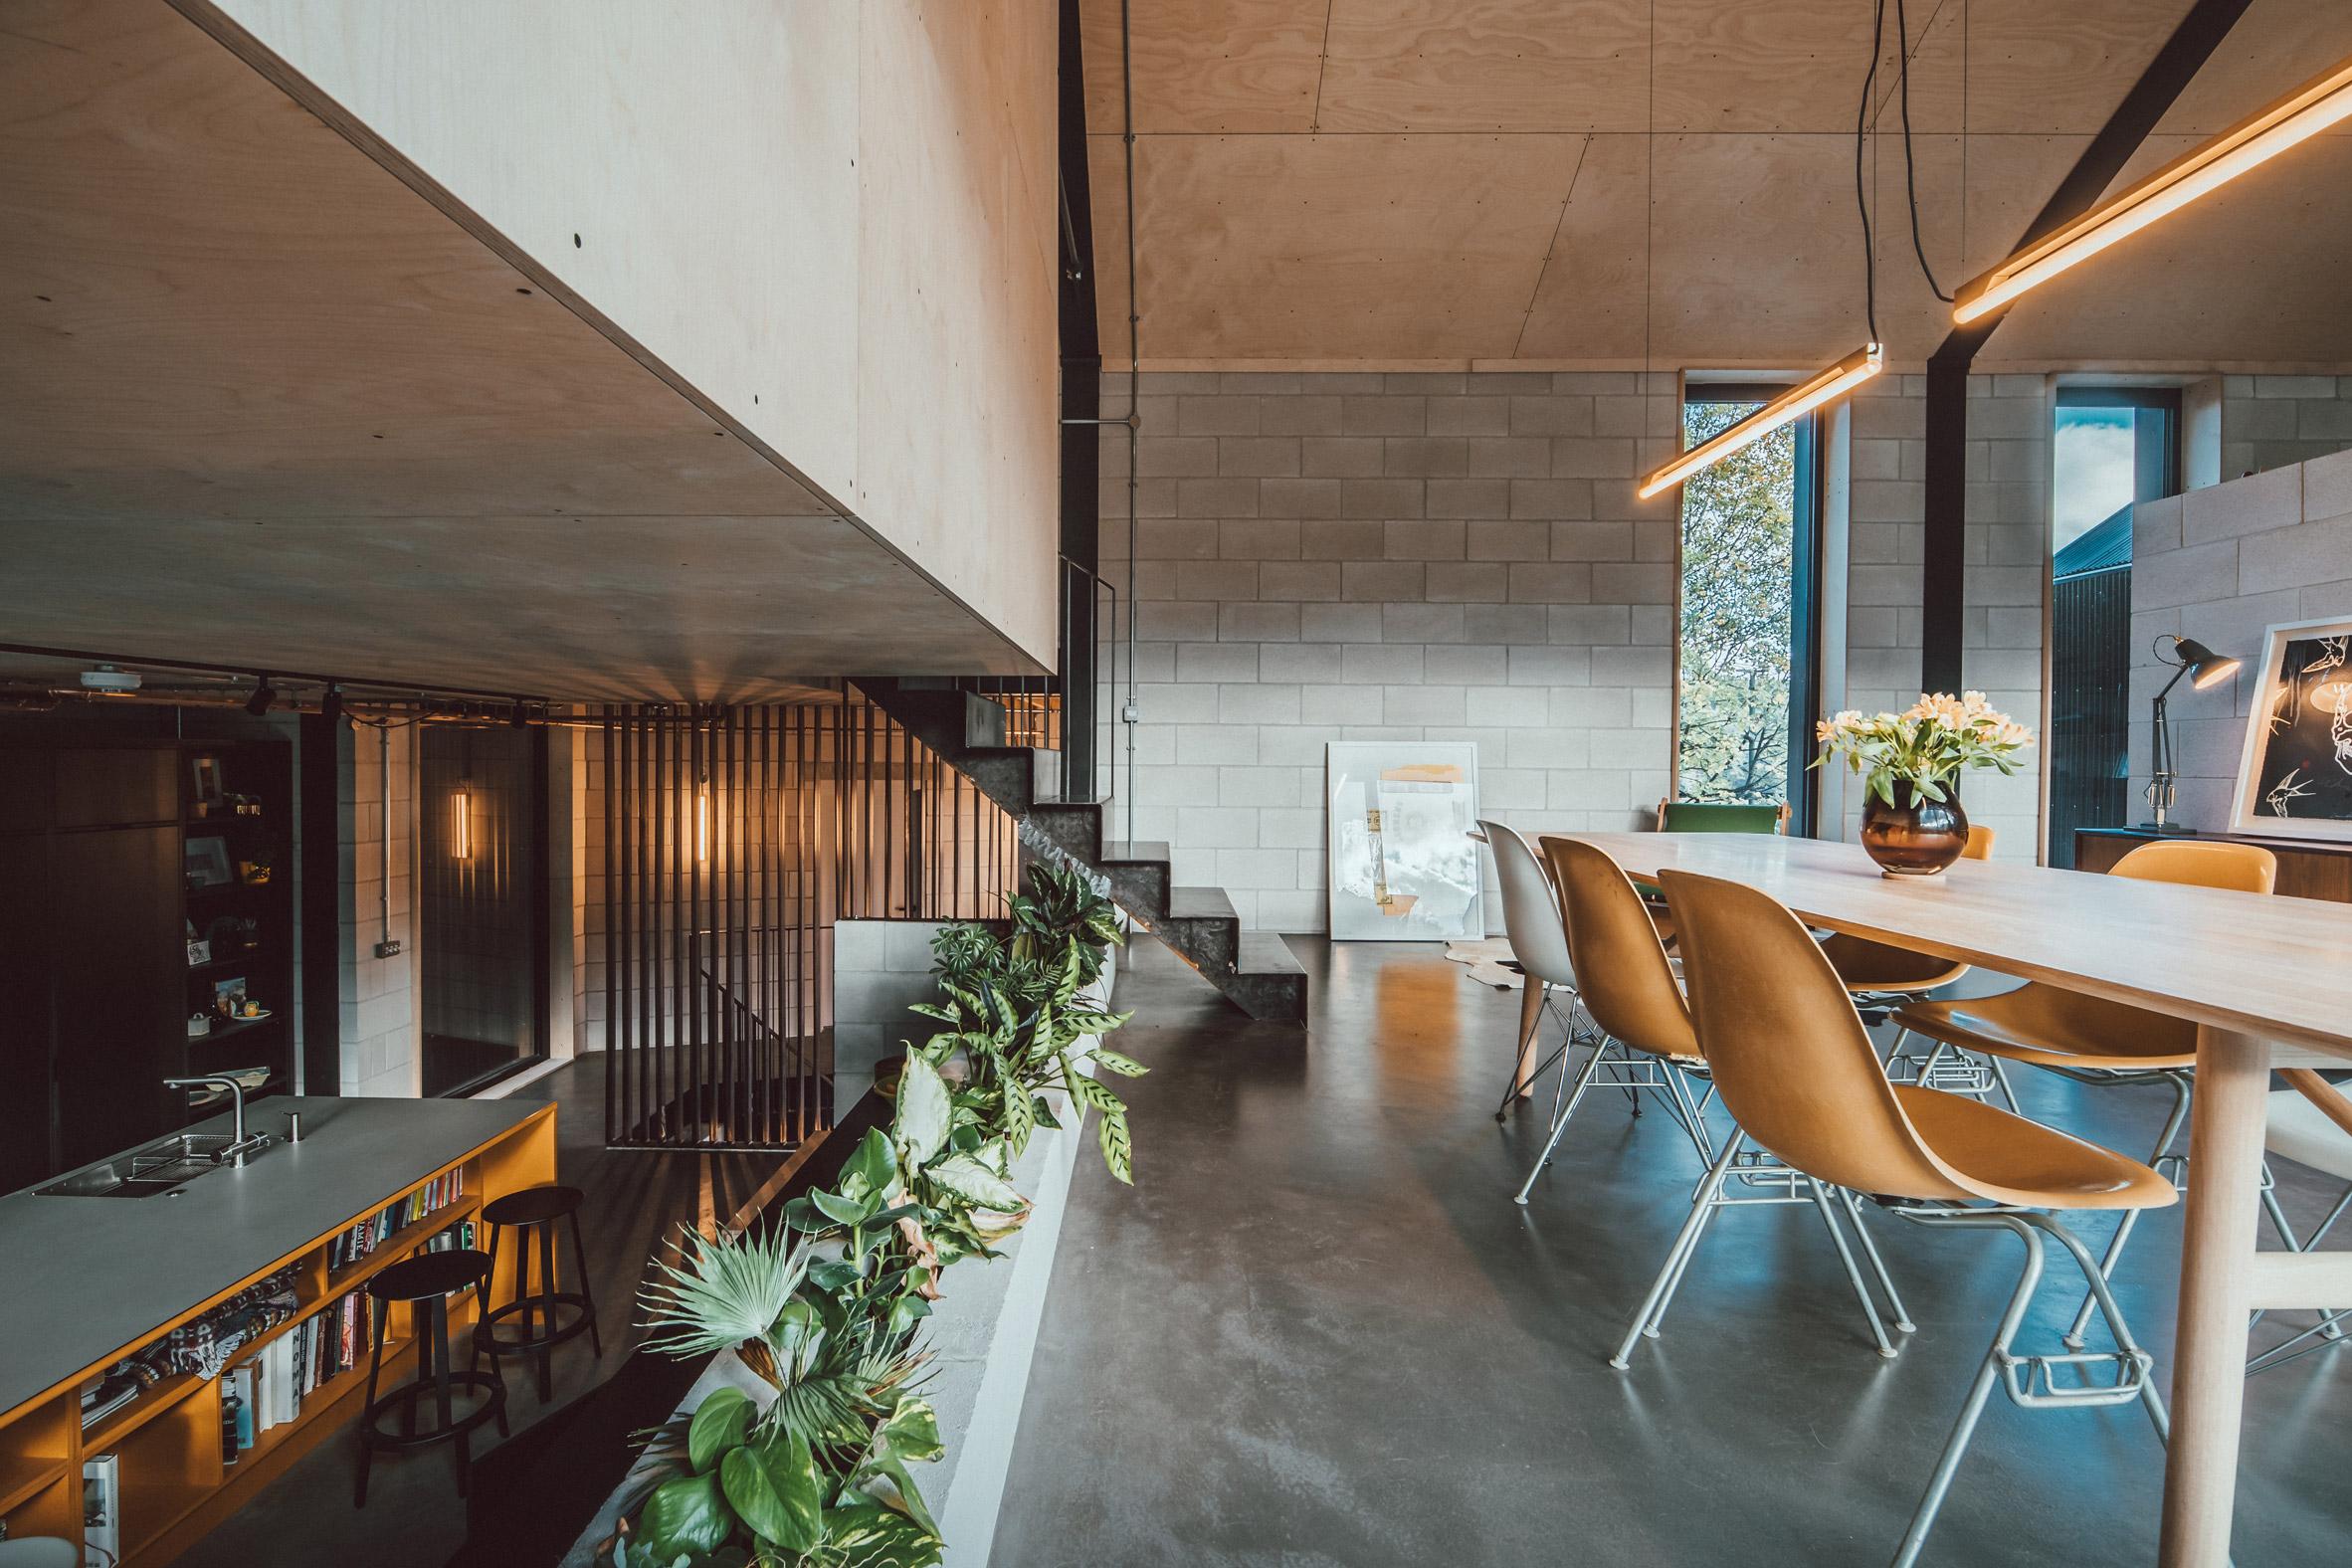 twin-build-nik-jon-draughty-coda-architectur-residential-bespoke-black-metal-house-sheffield-uk-_dezeen_2364_col_42.jpg